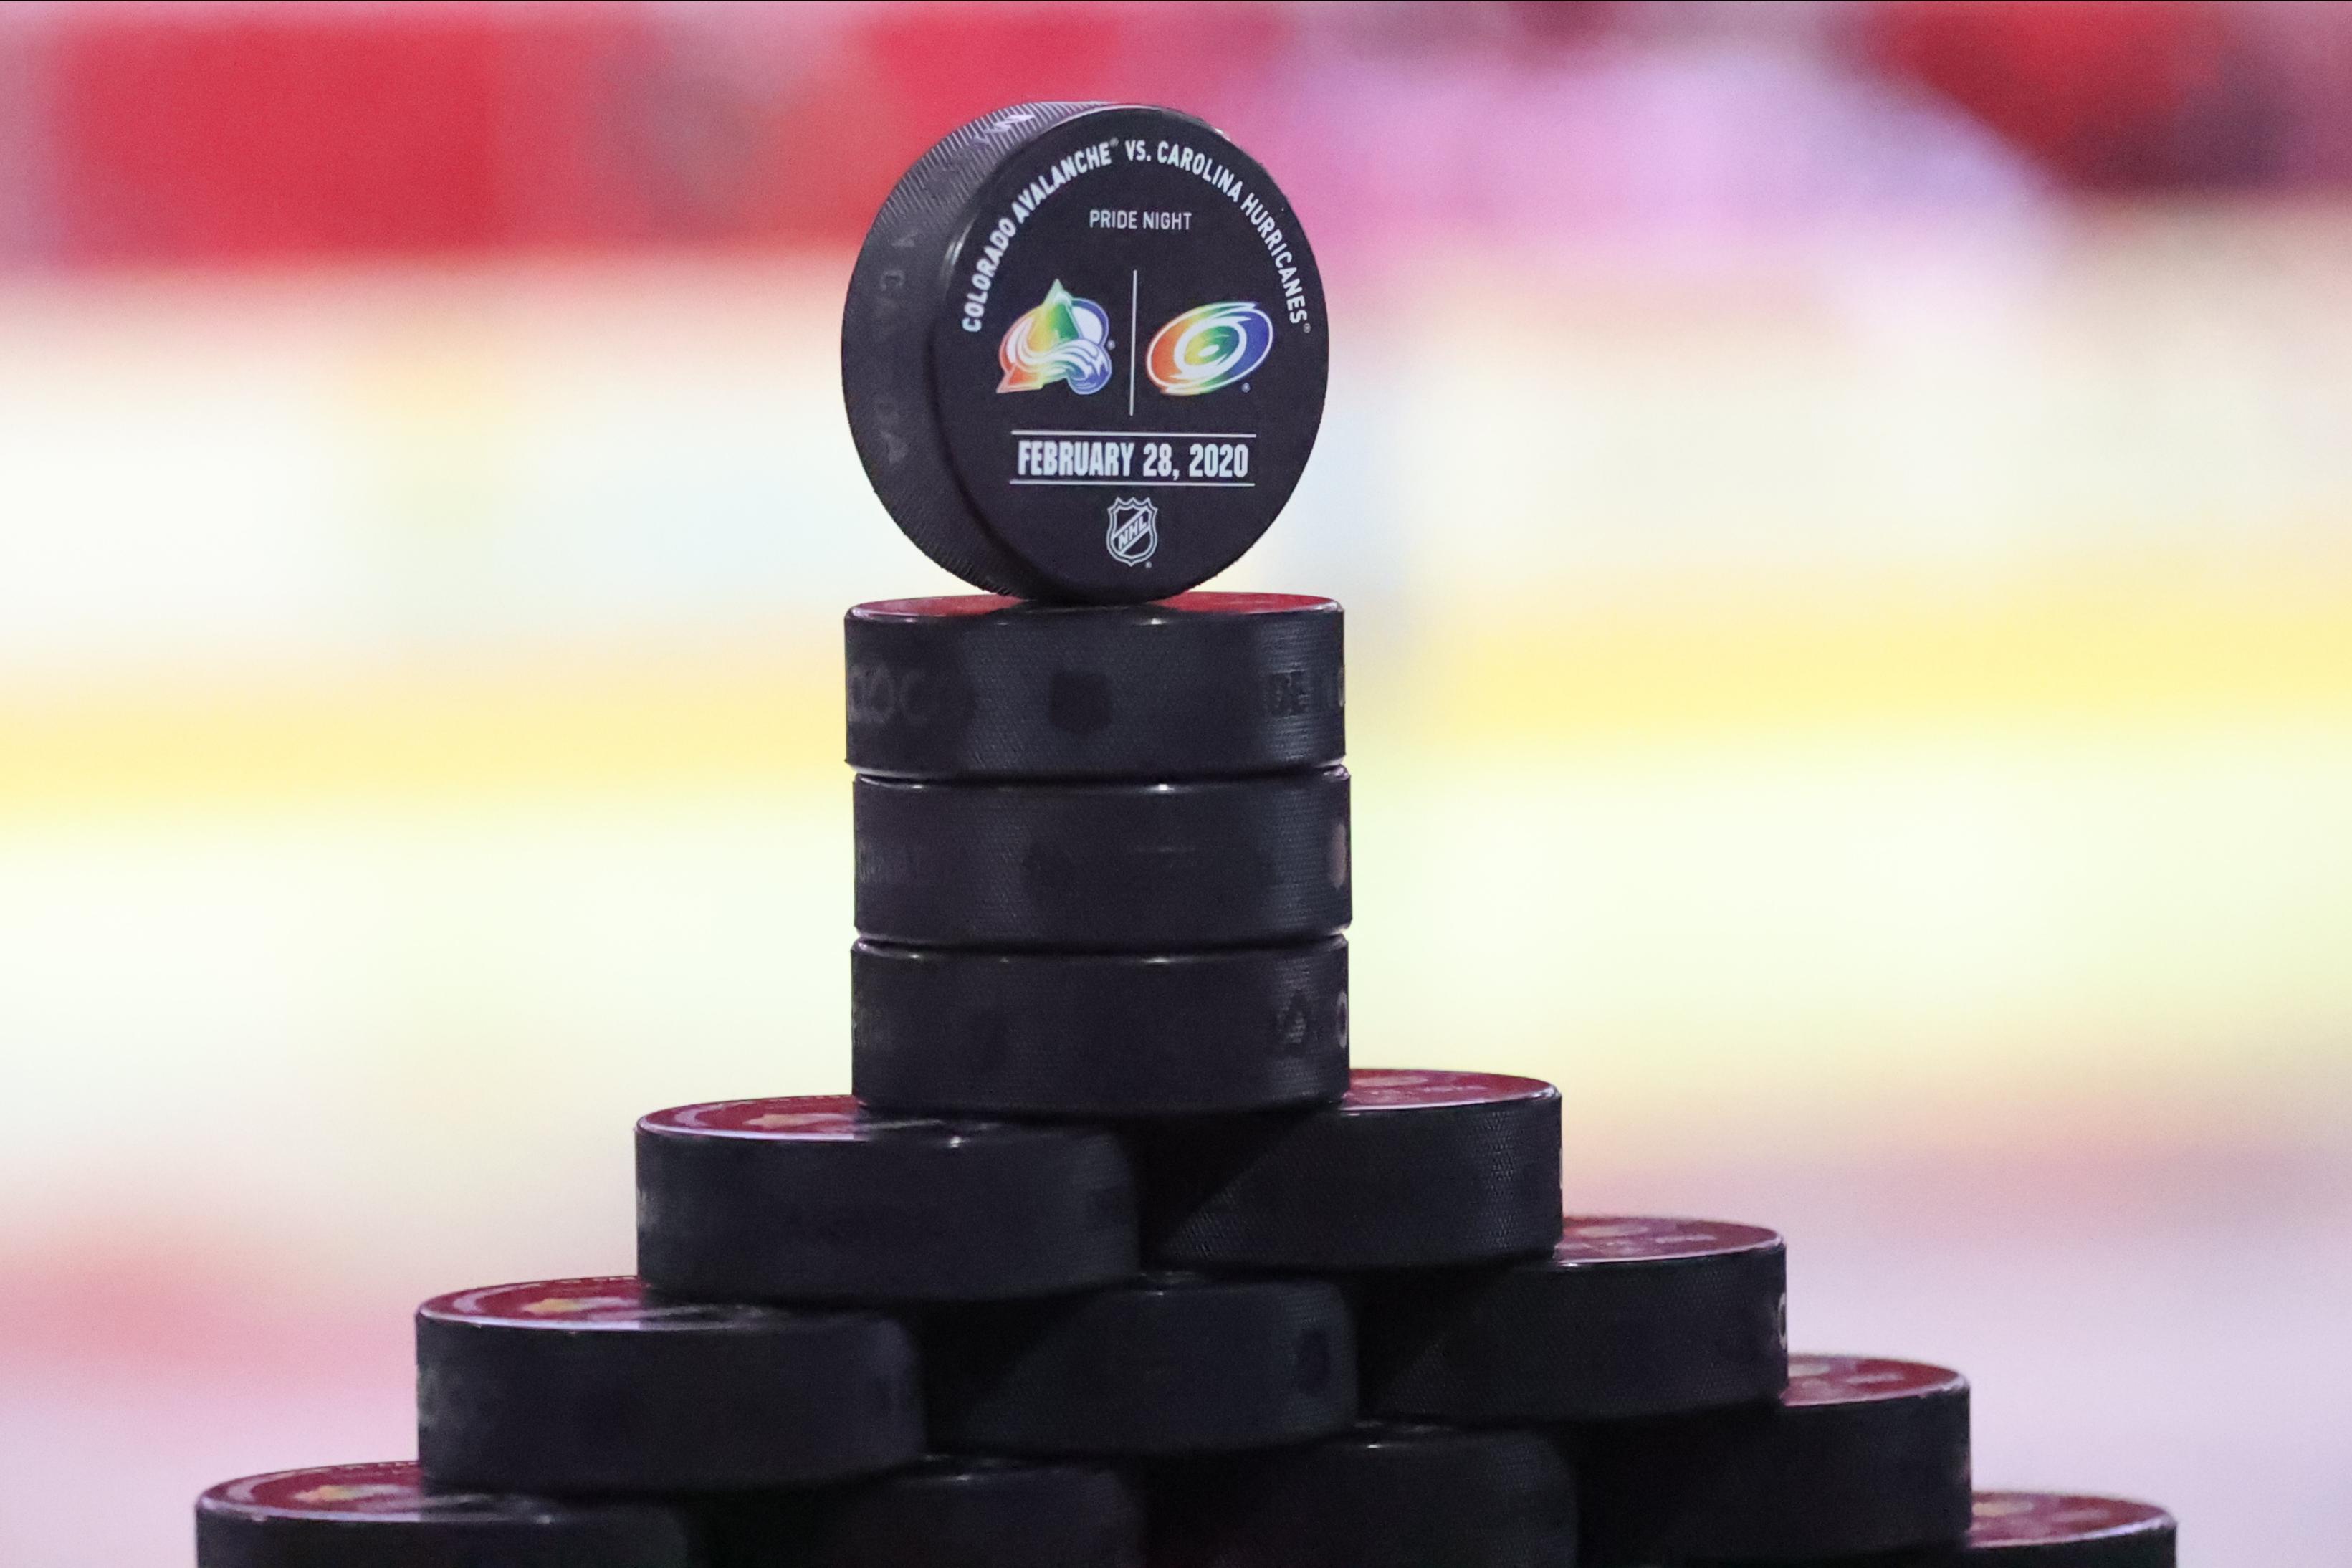 NHL: FEB 28 Avalanche at Hurricanes